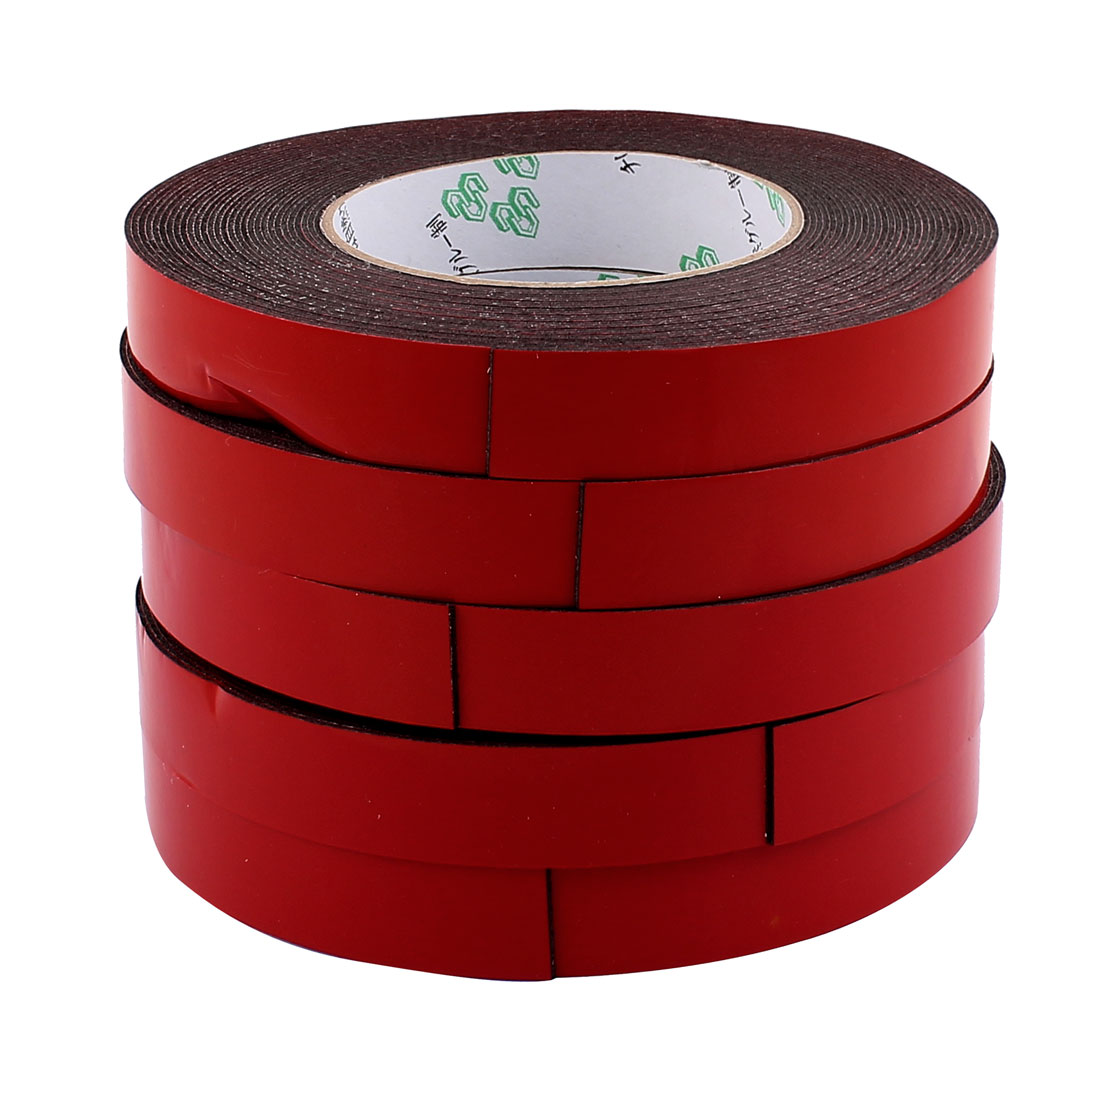 5 Pcs 20mmx1mm Double Sided Sponge Tape Adhesive Sticker Foam Glue Strip Sealing 10 Meters 33Ft